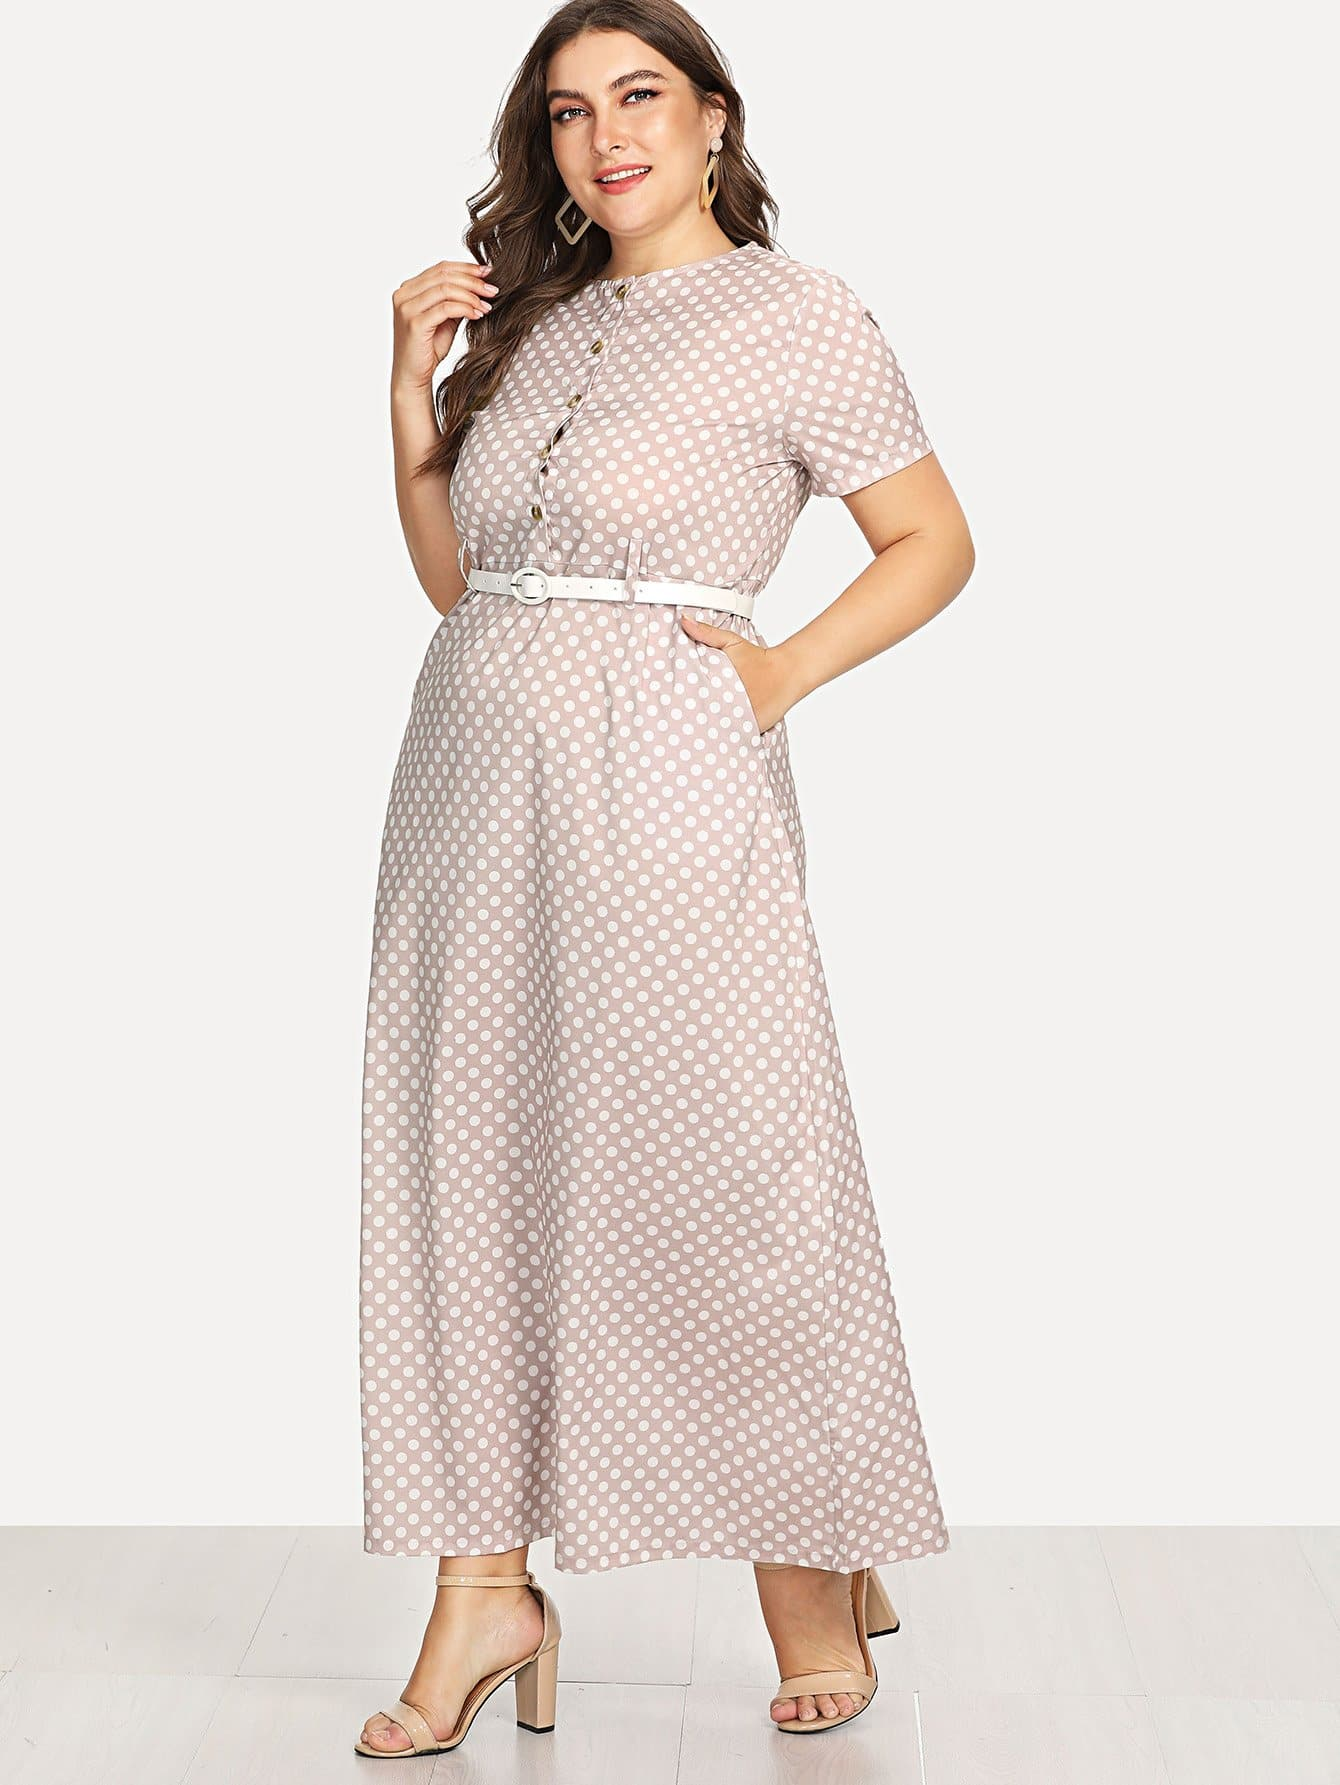 Button Front Polka Dot Belted Dress button front halterneck polka dot top